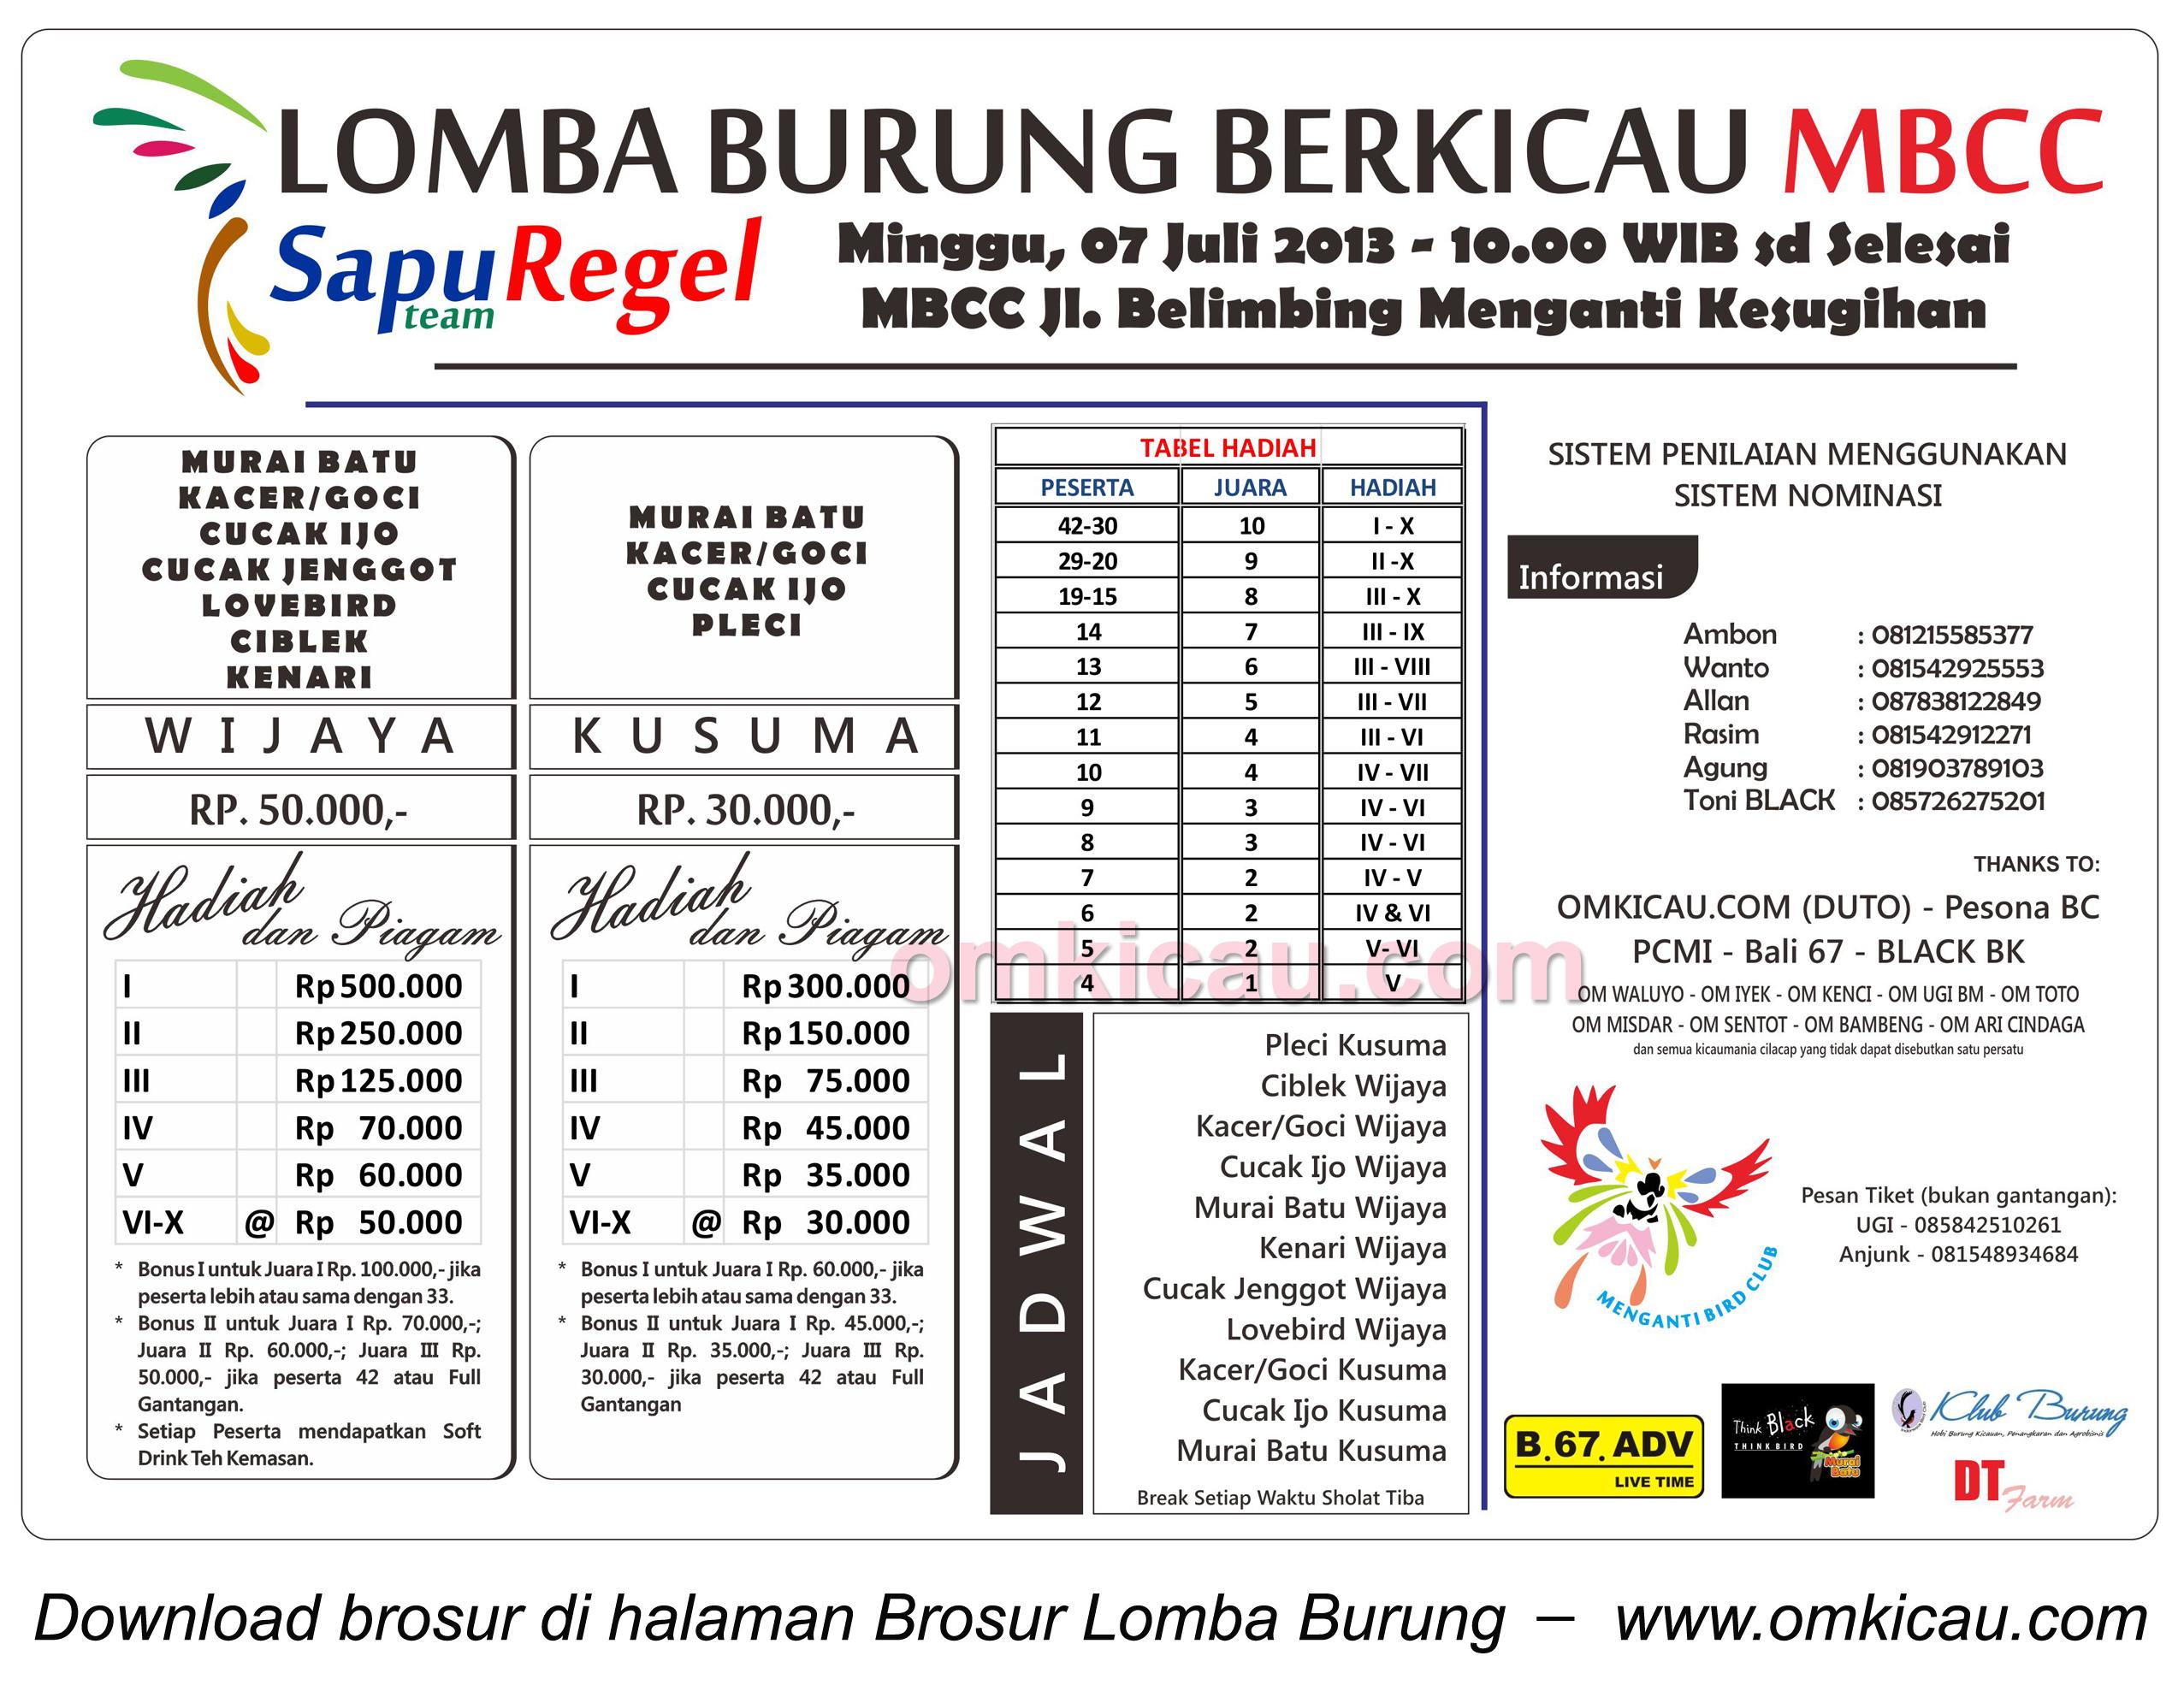 Brosur Lomba Burung Berkicau MBCC Cilacap - 7 Juli 2013